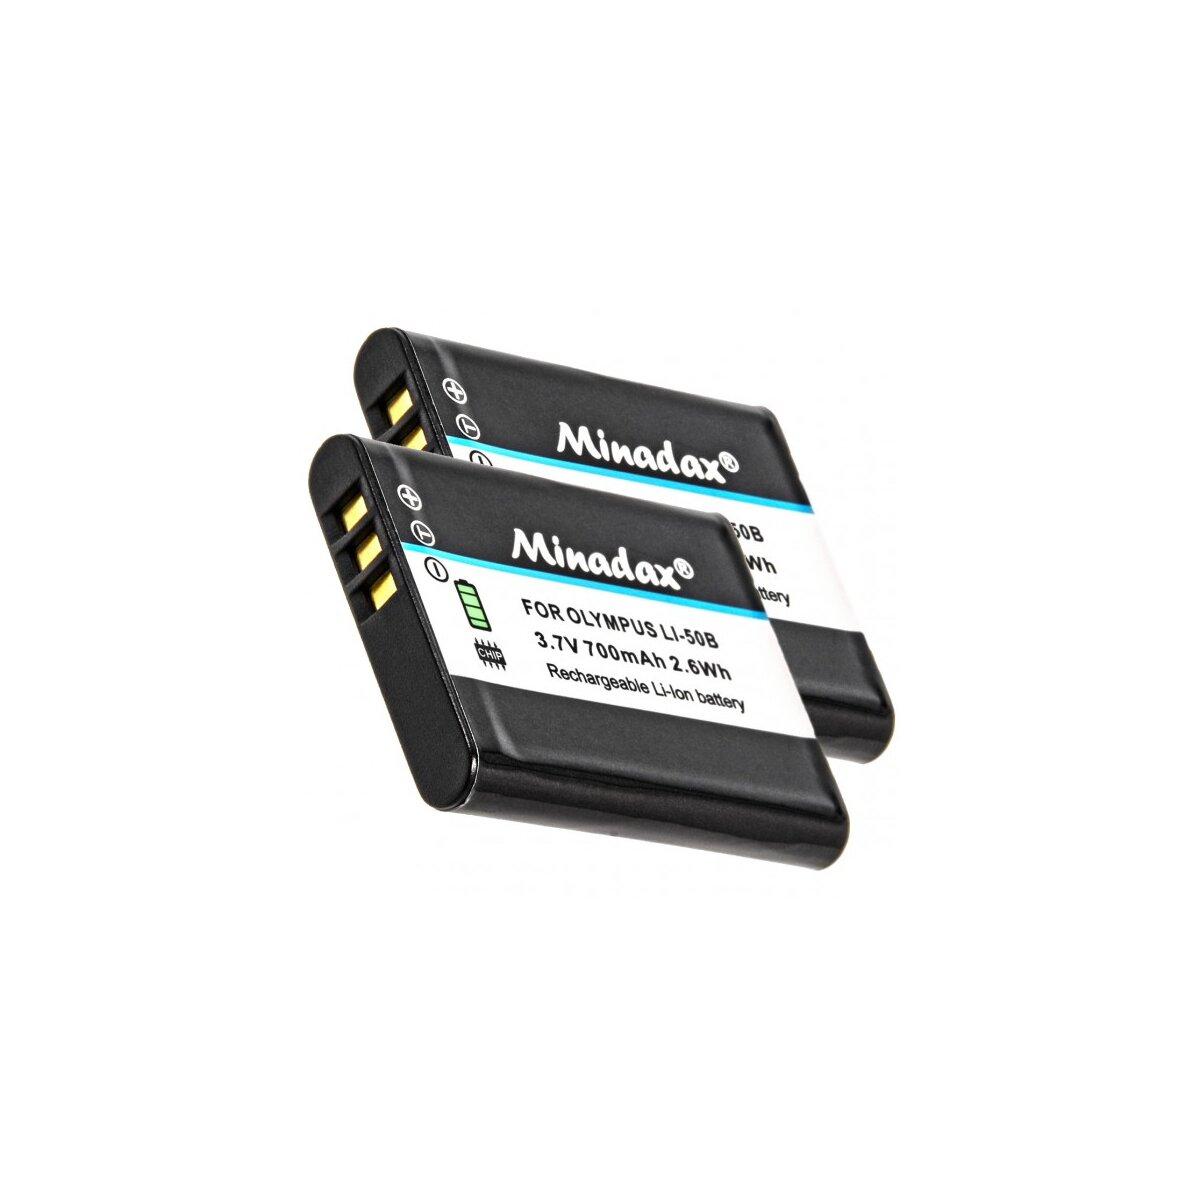 2x Minadax® Qualitaetsakku mit echten 700 mAh fuer Olympus, wie LI-50B - Intelligentes Akkusystem mit Chip